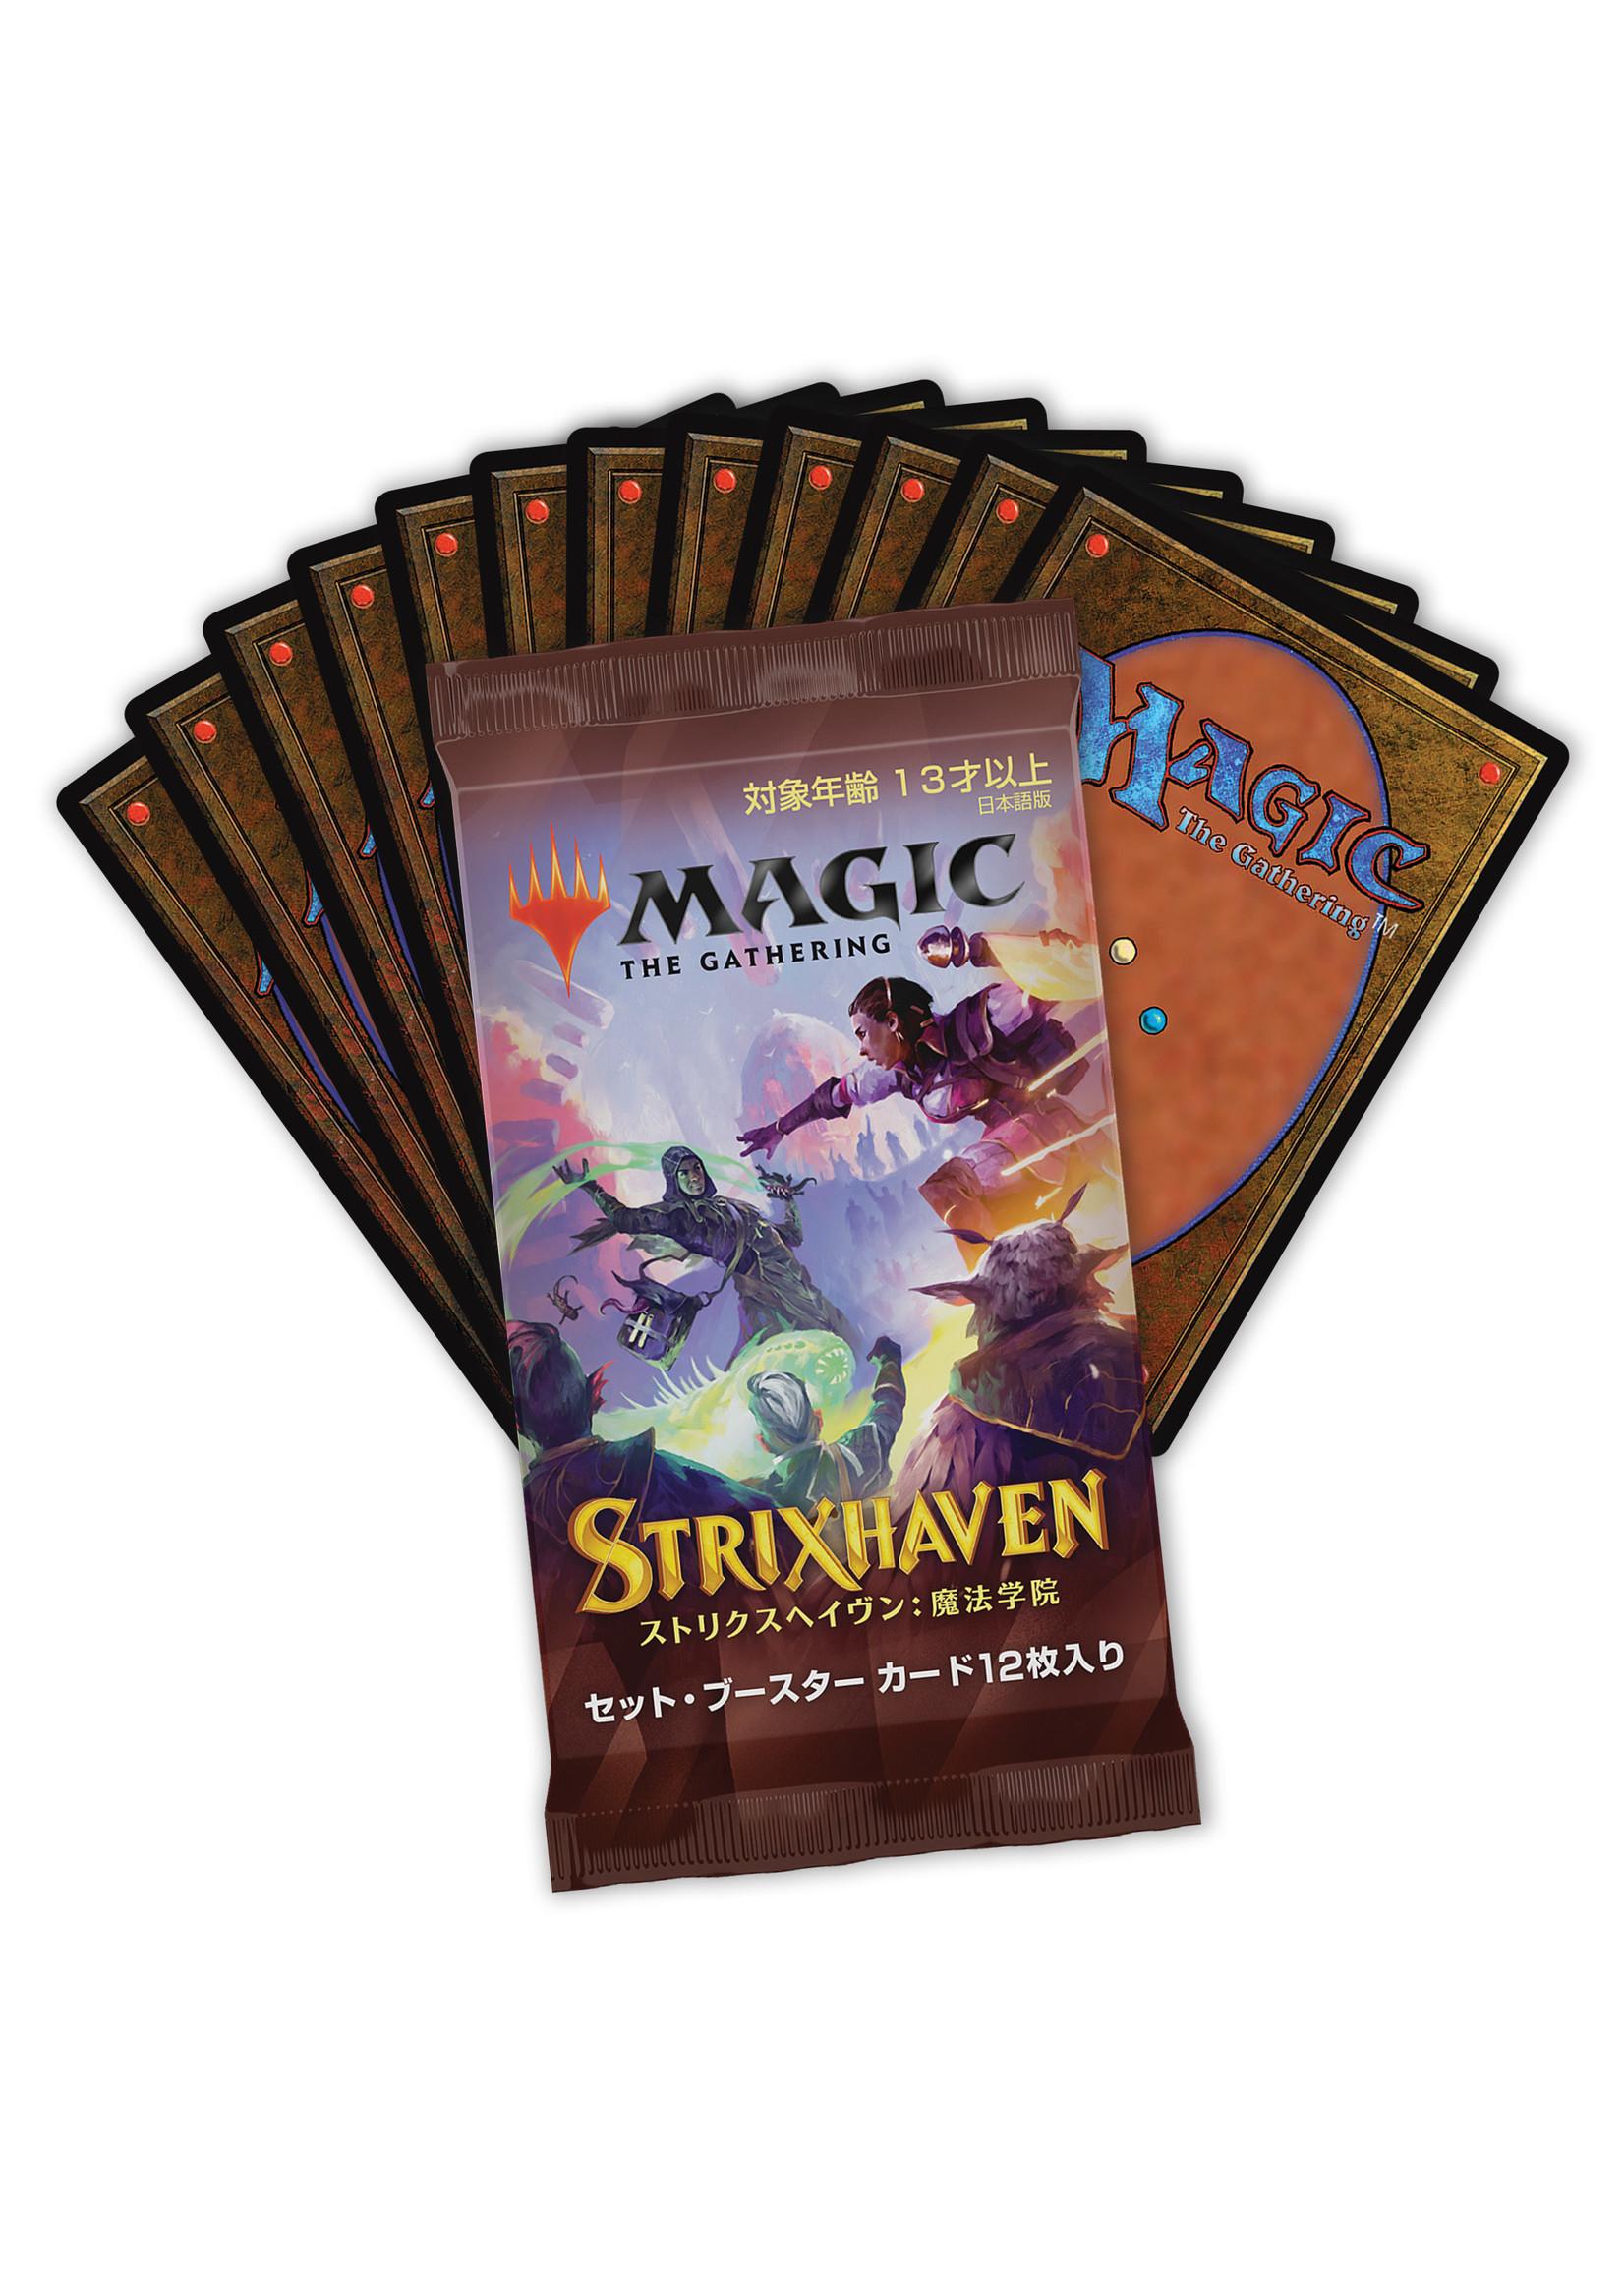 Magic: The Gathering Strixhaven Japanese Set single